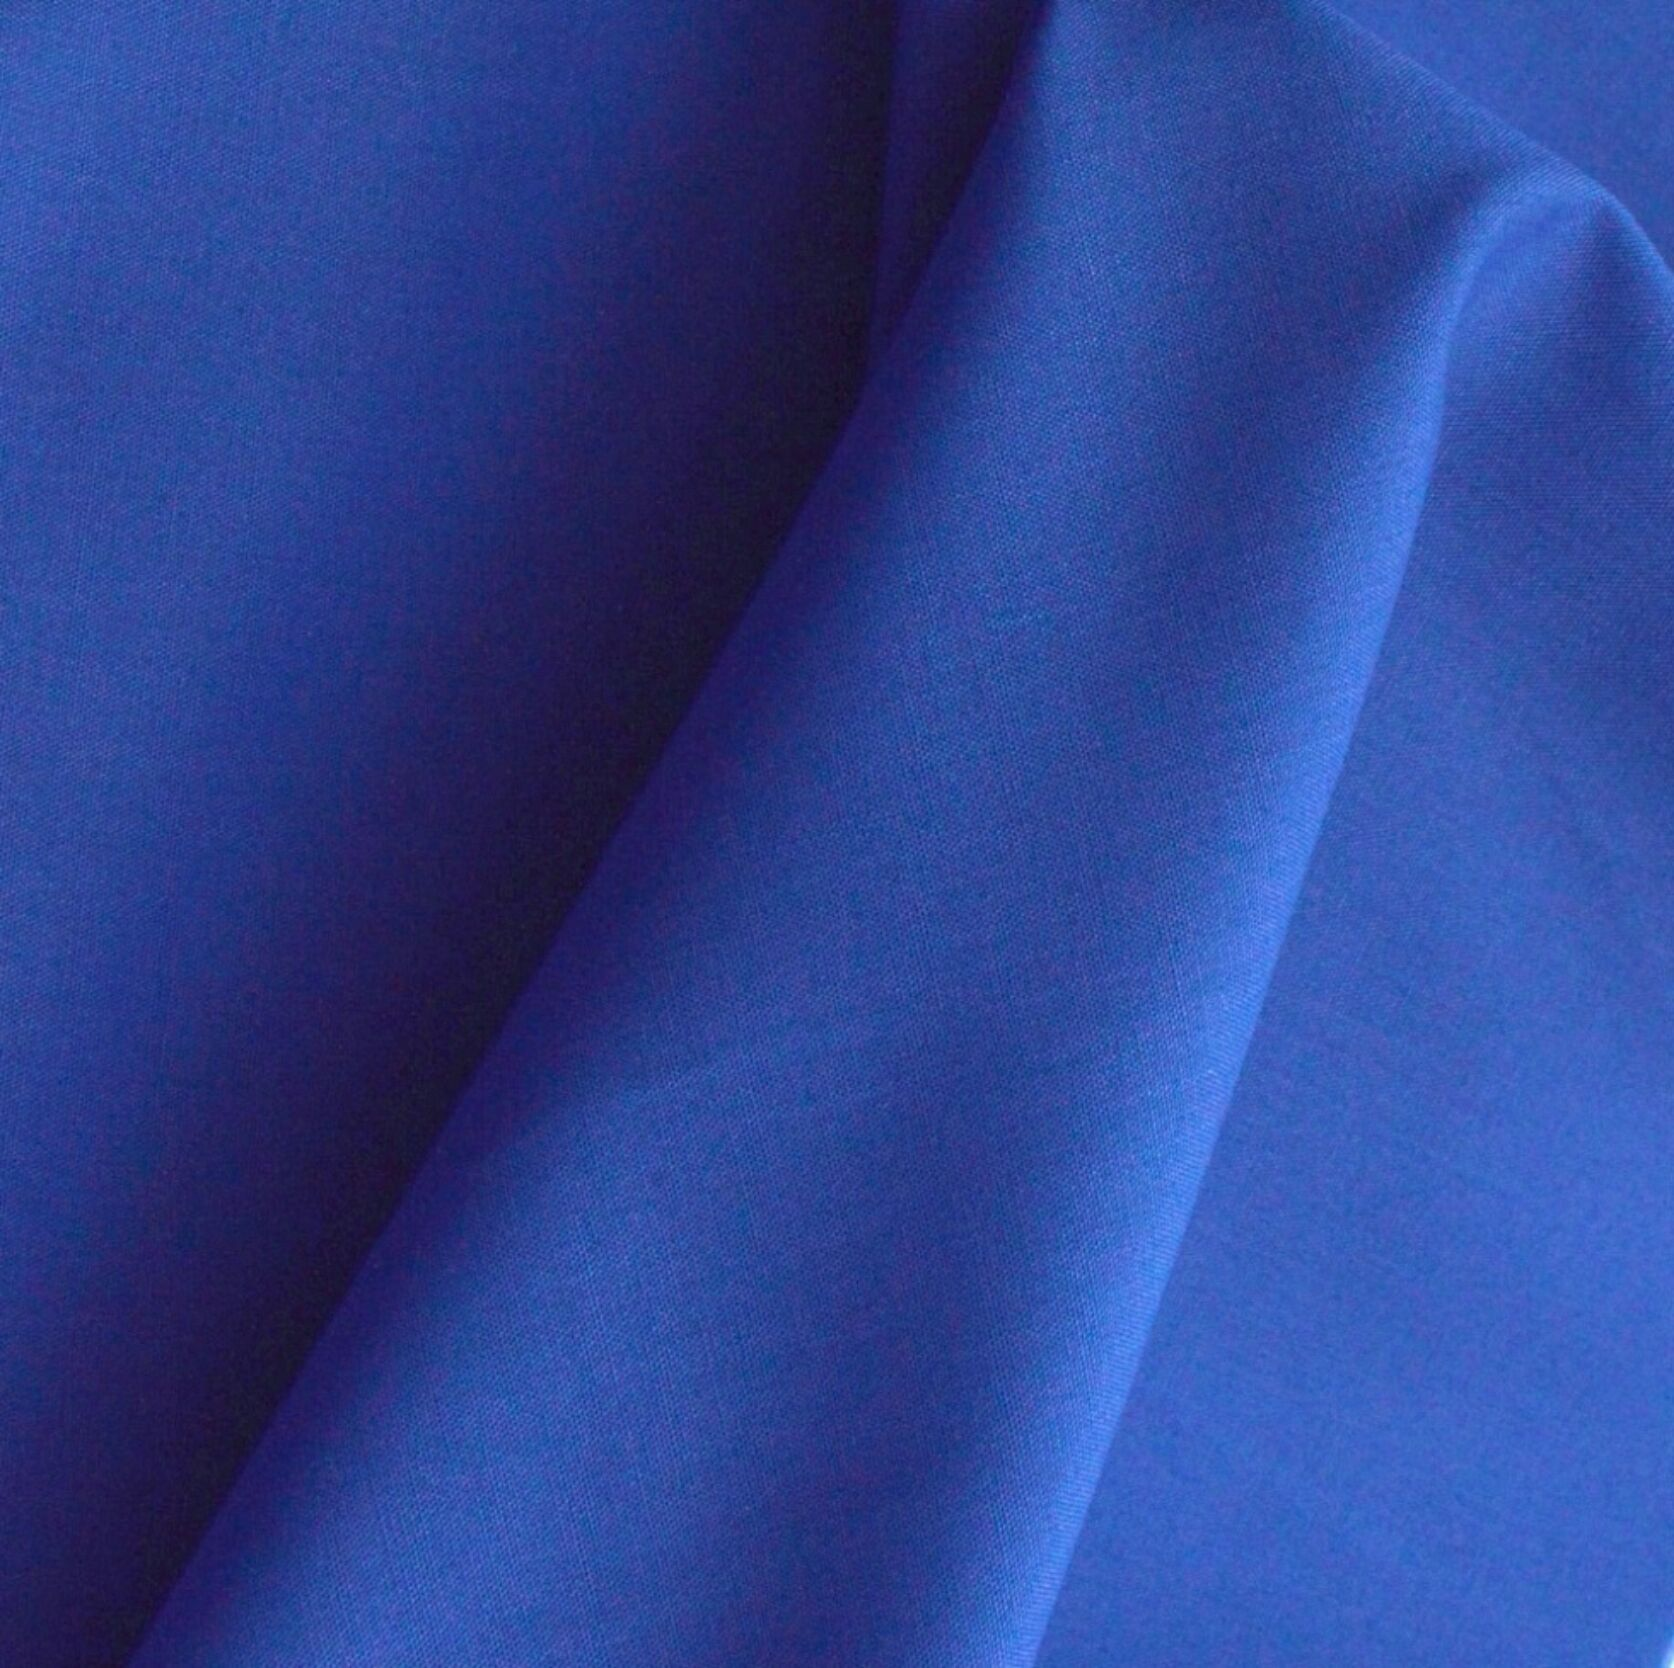 "10 MTR METALLIC BLUE ACETATE HEAVY BRIDAL SATIN FABRIC 45"" WIDE NEW IN STOCK £40"